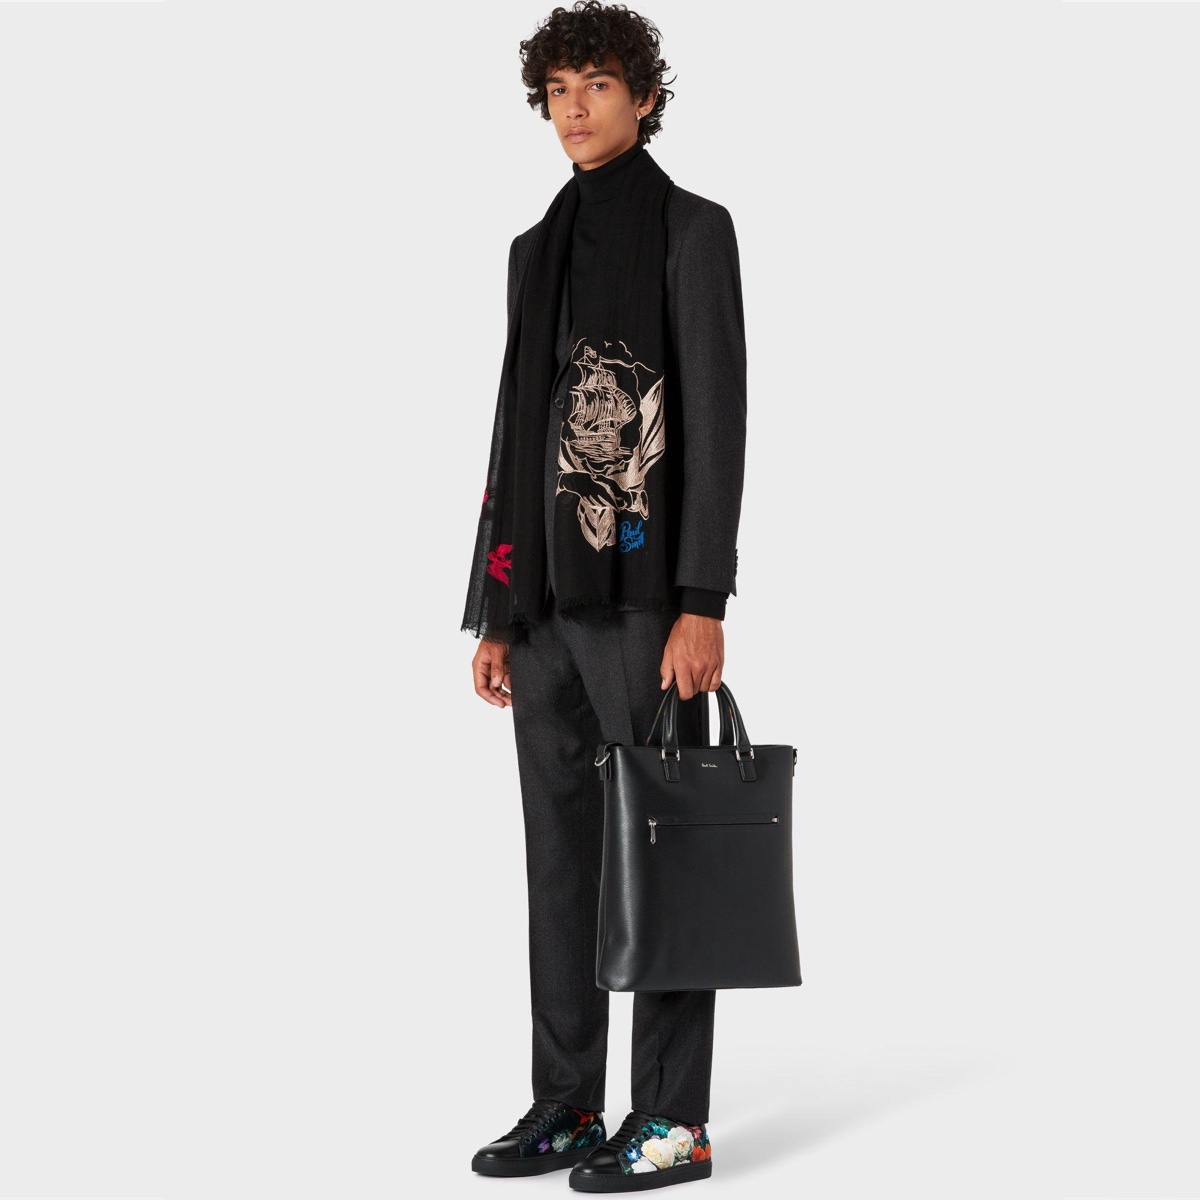 paul-smith-Black-Black-Embossed-Leather-Tote-Bag-With-bright-Stripe-Trim (2).jpg